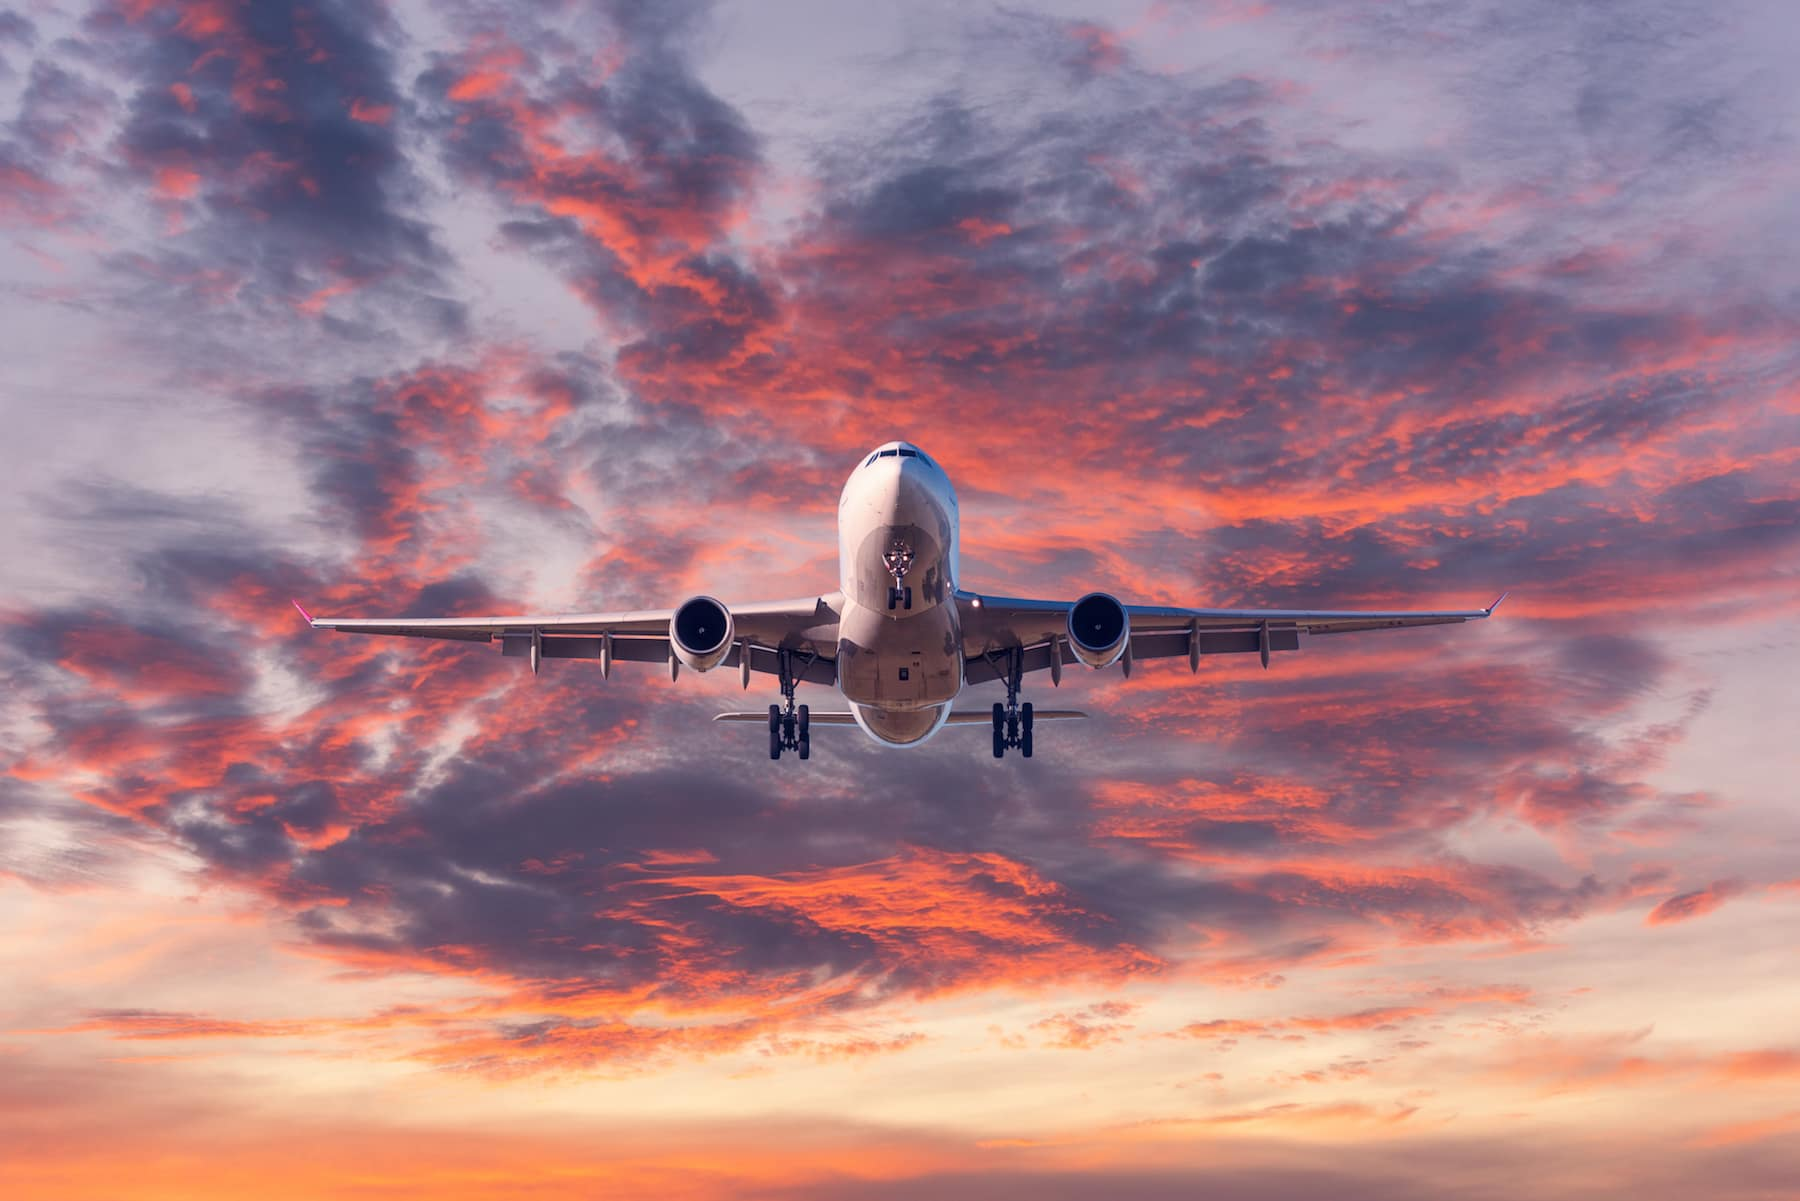 landing-passenger-airplane-at-colorful-sunset-MRSHV6Q